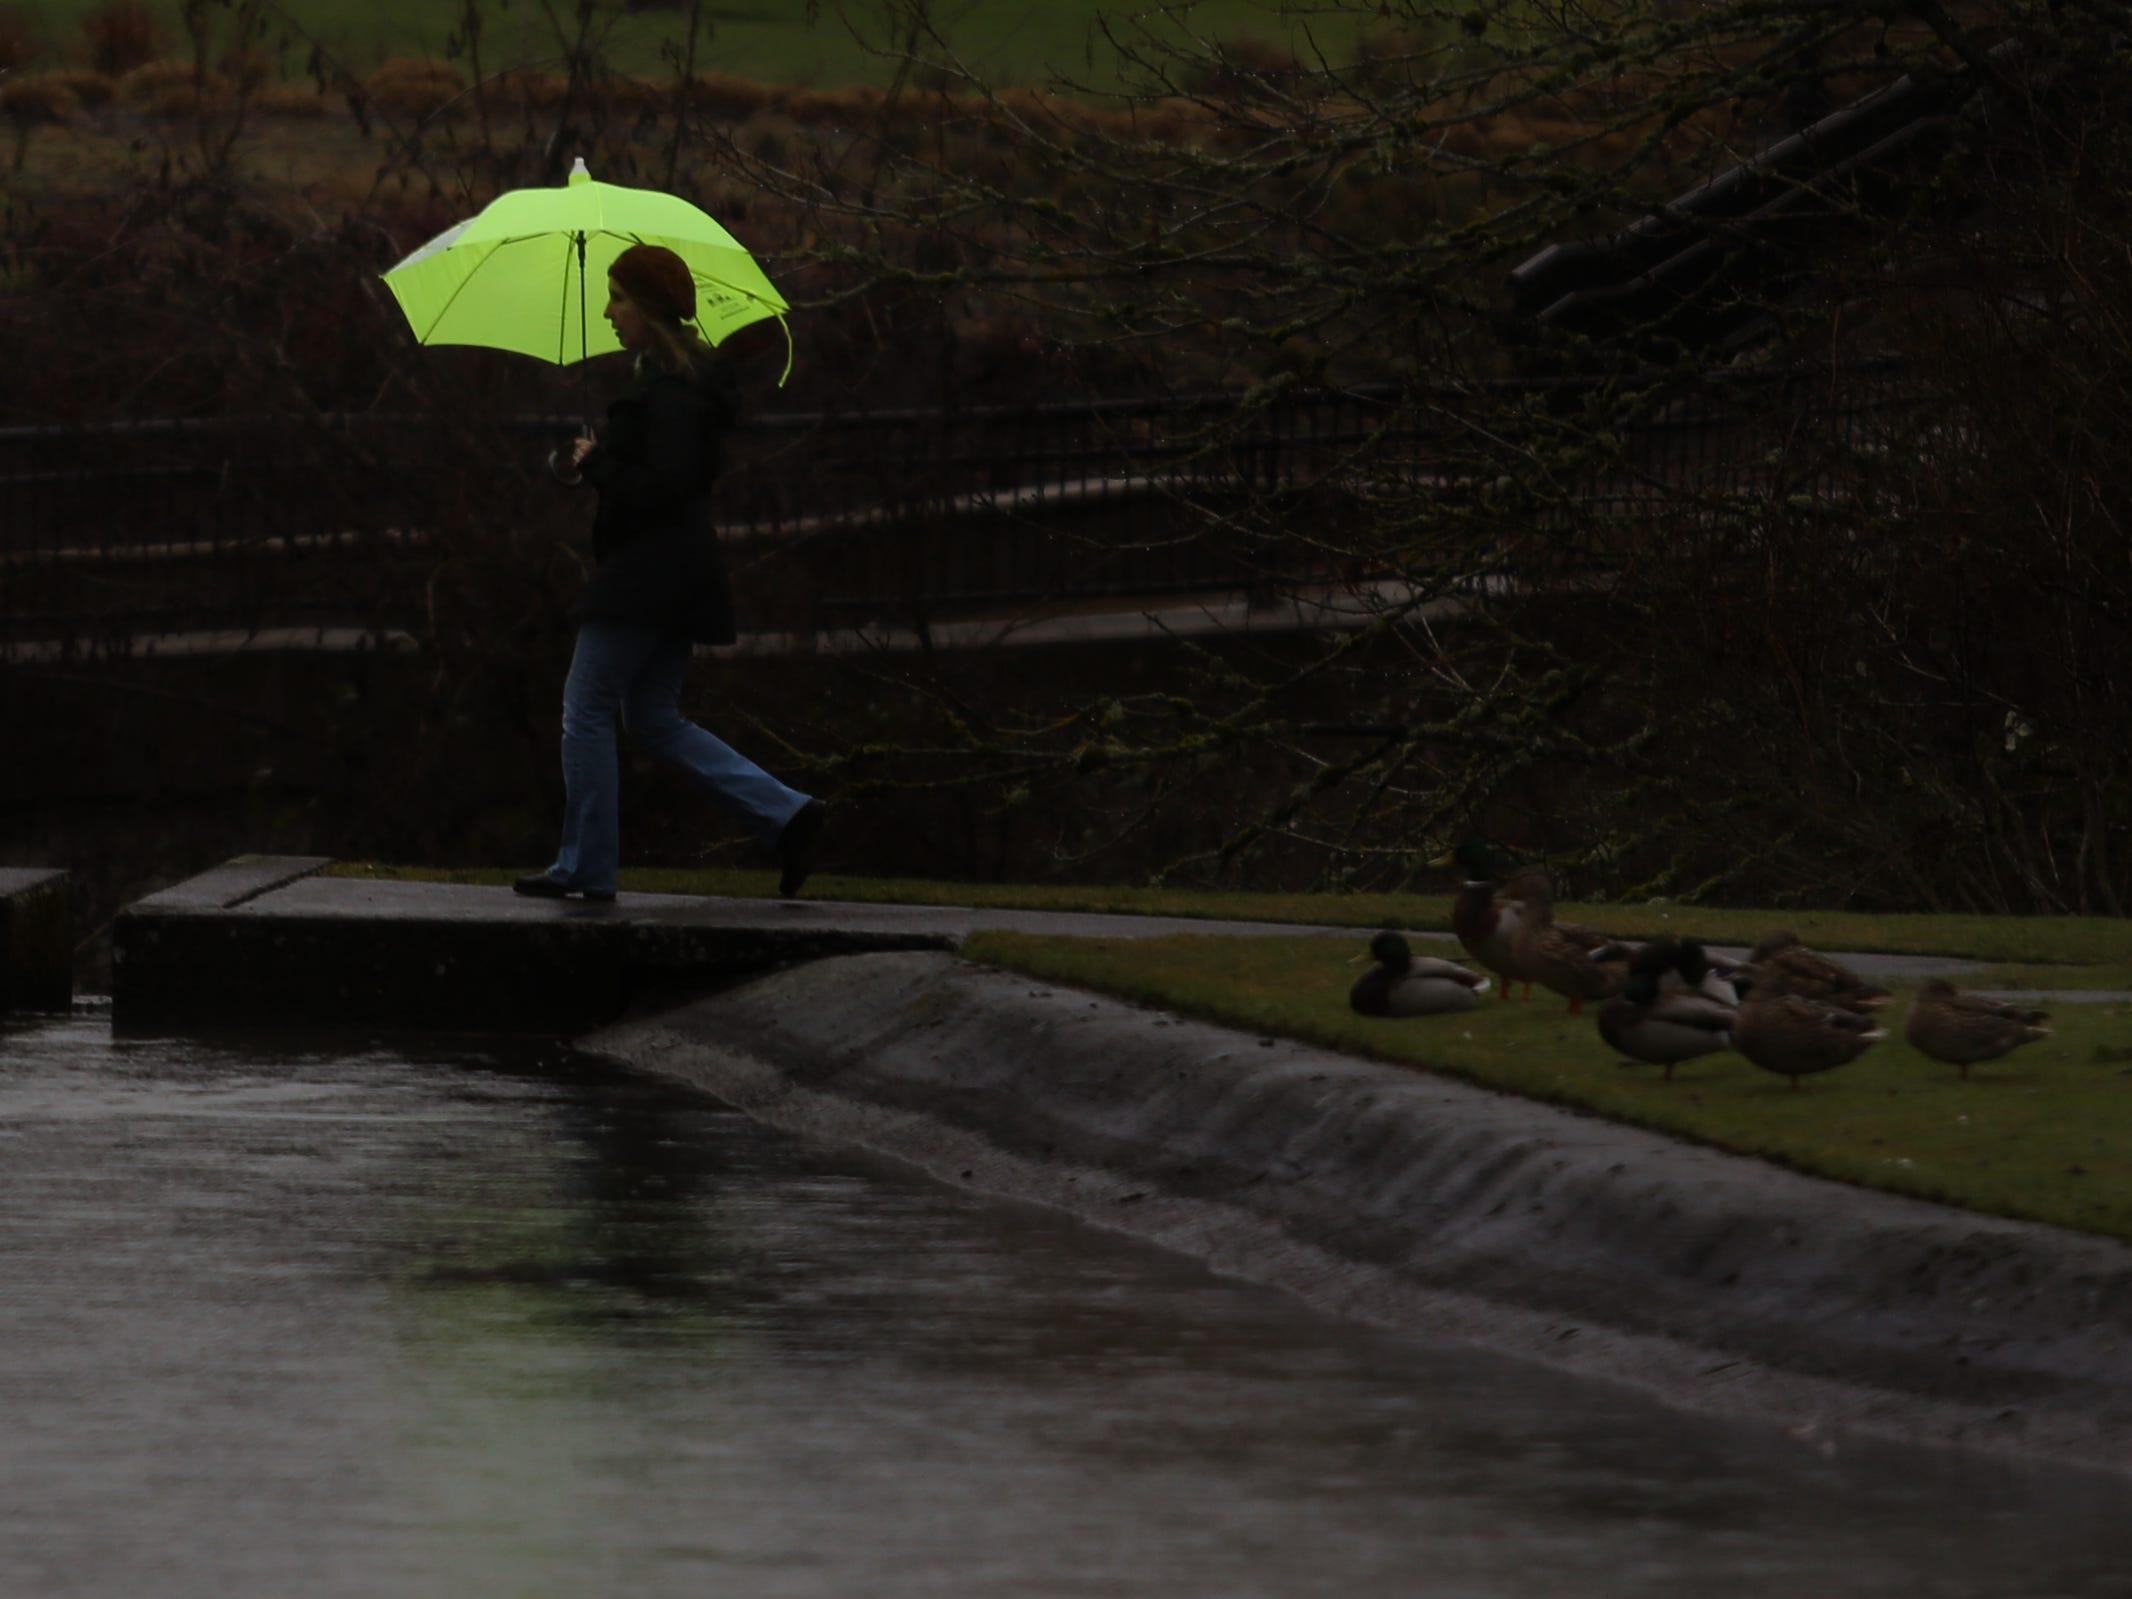 A woman uses an umbrella as rain falls in Salem on Thursday, Feb. 14, 2019.